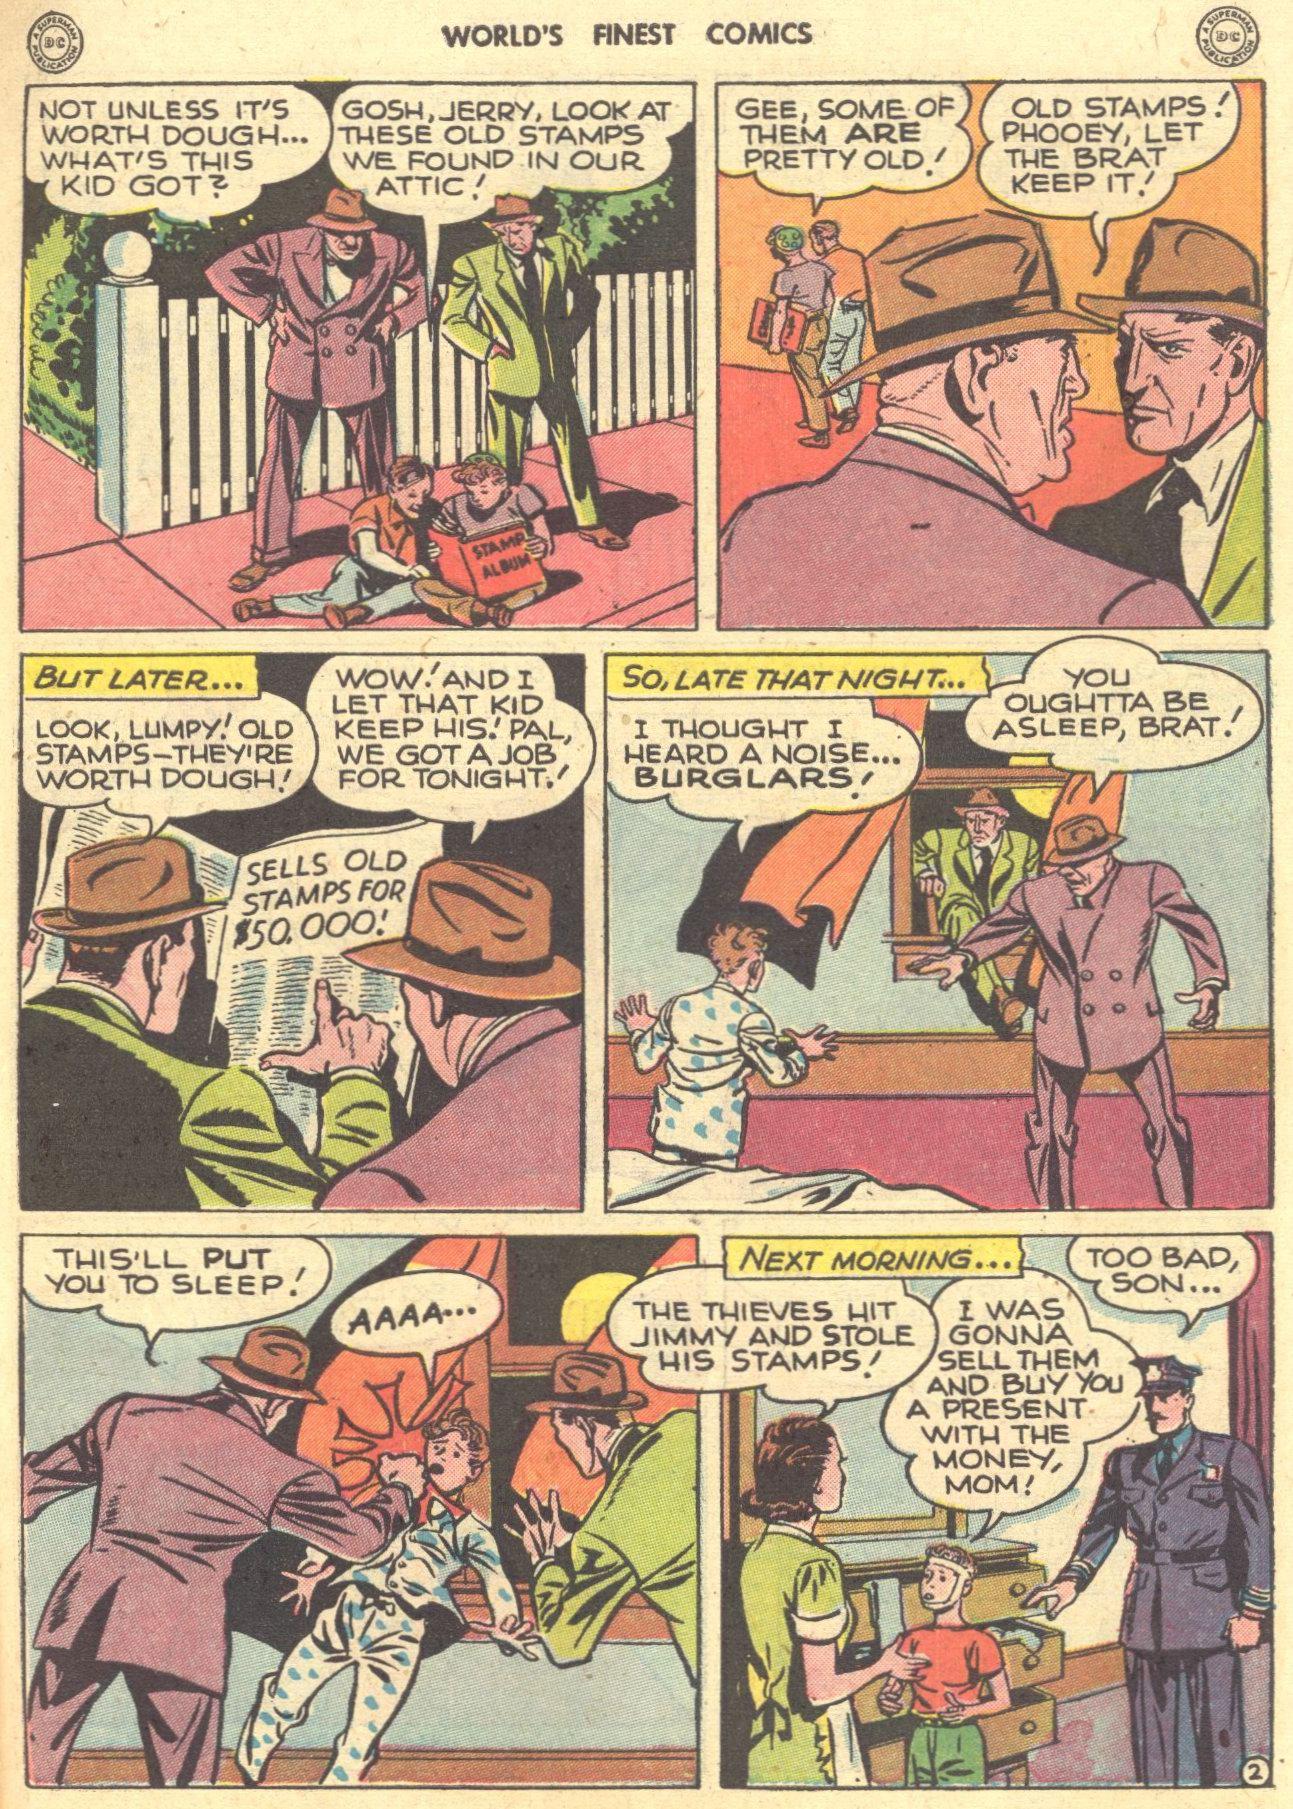 Read online World's Finest Comics comic -  Issue #28 - 44